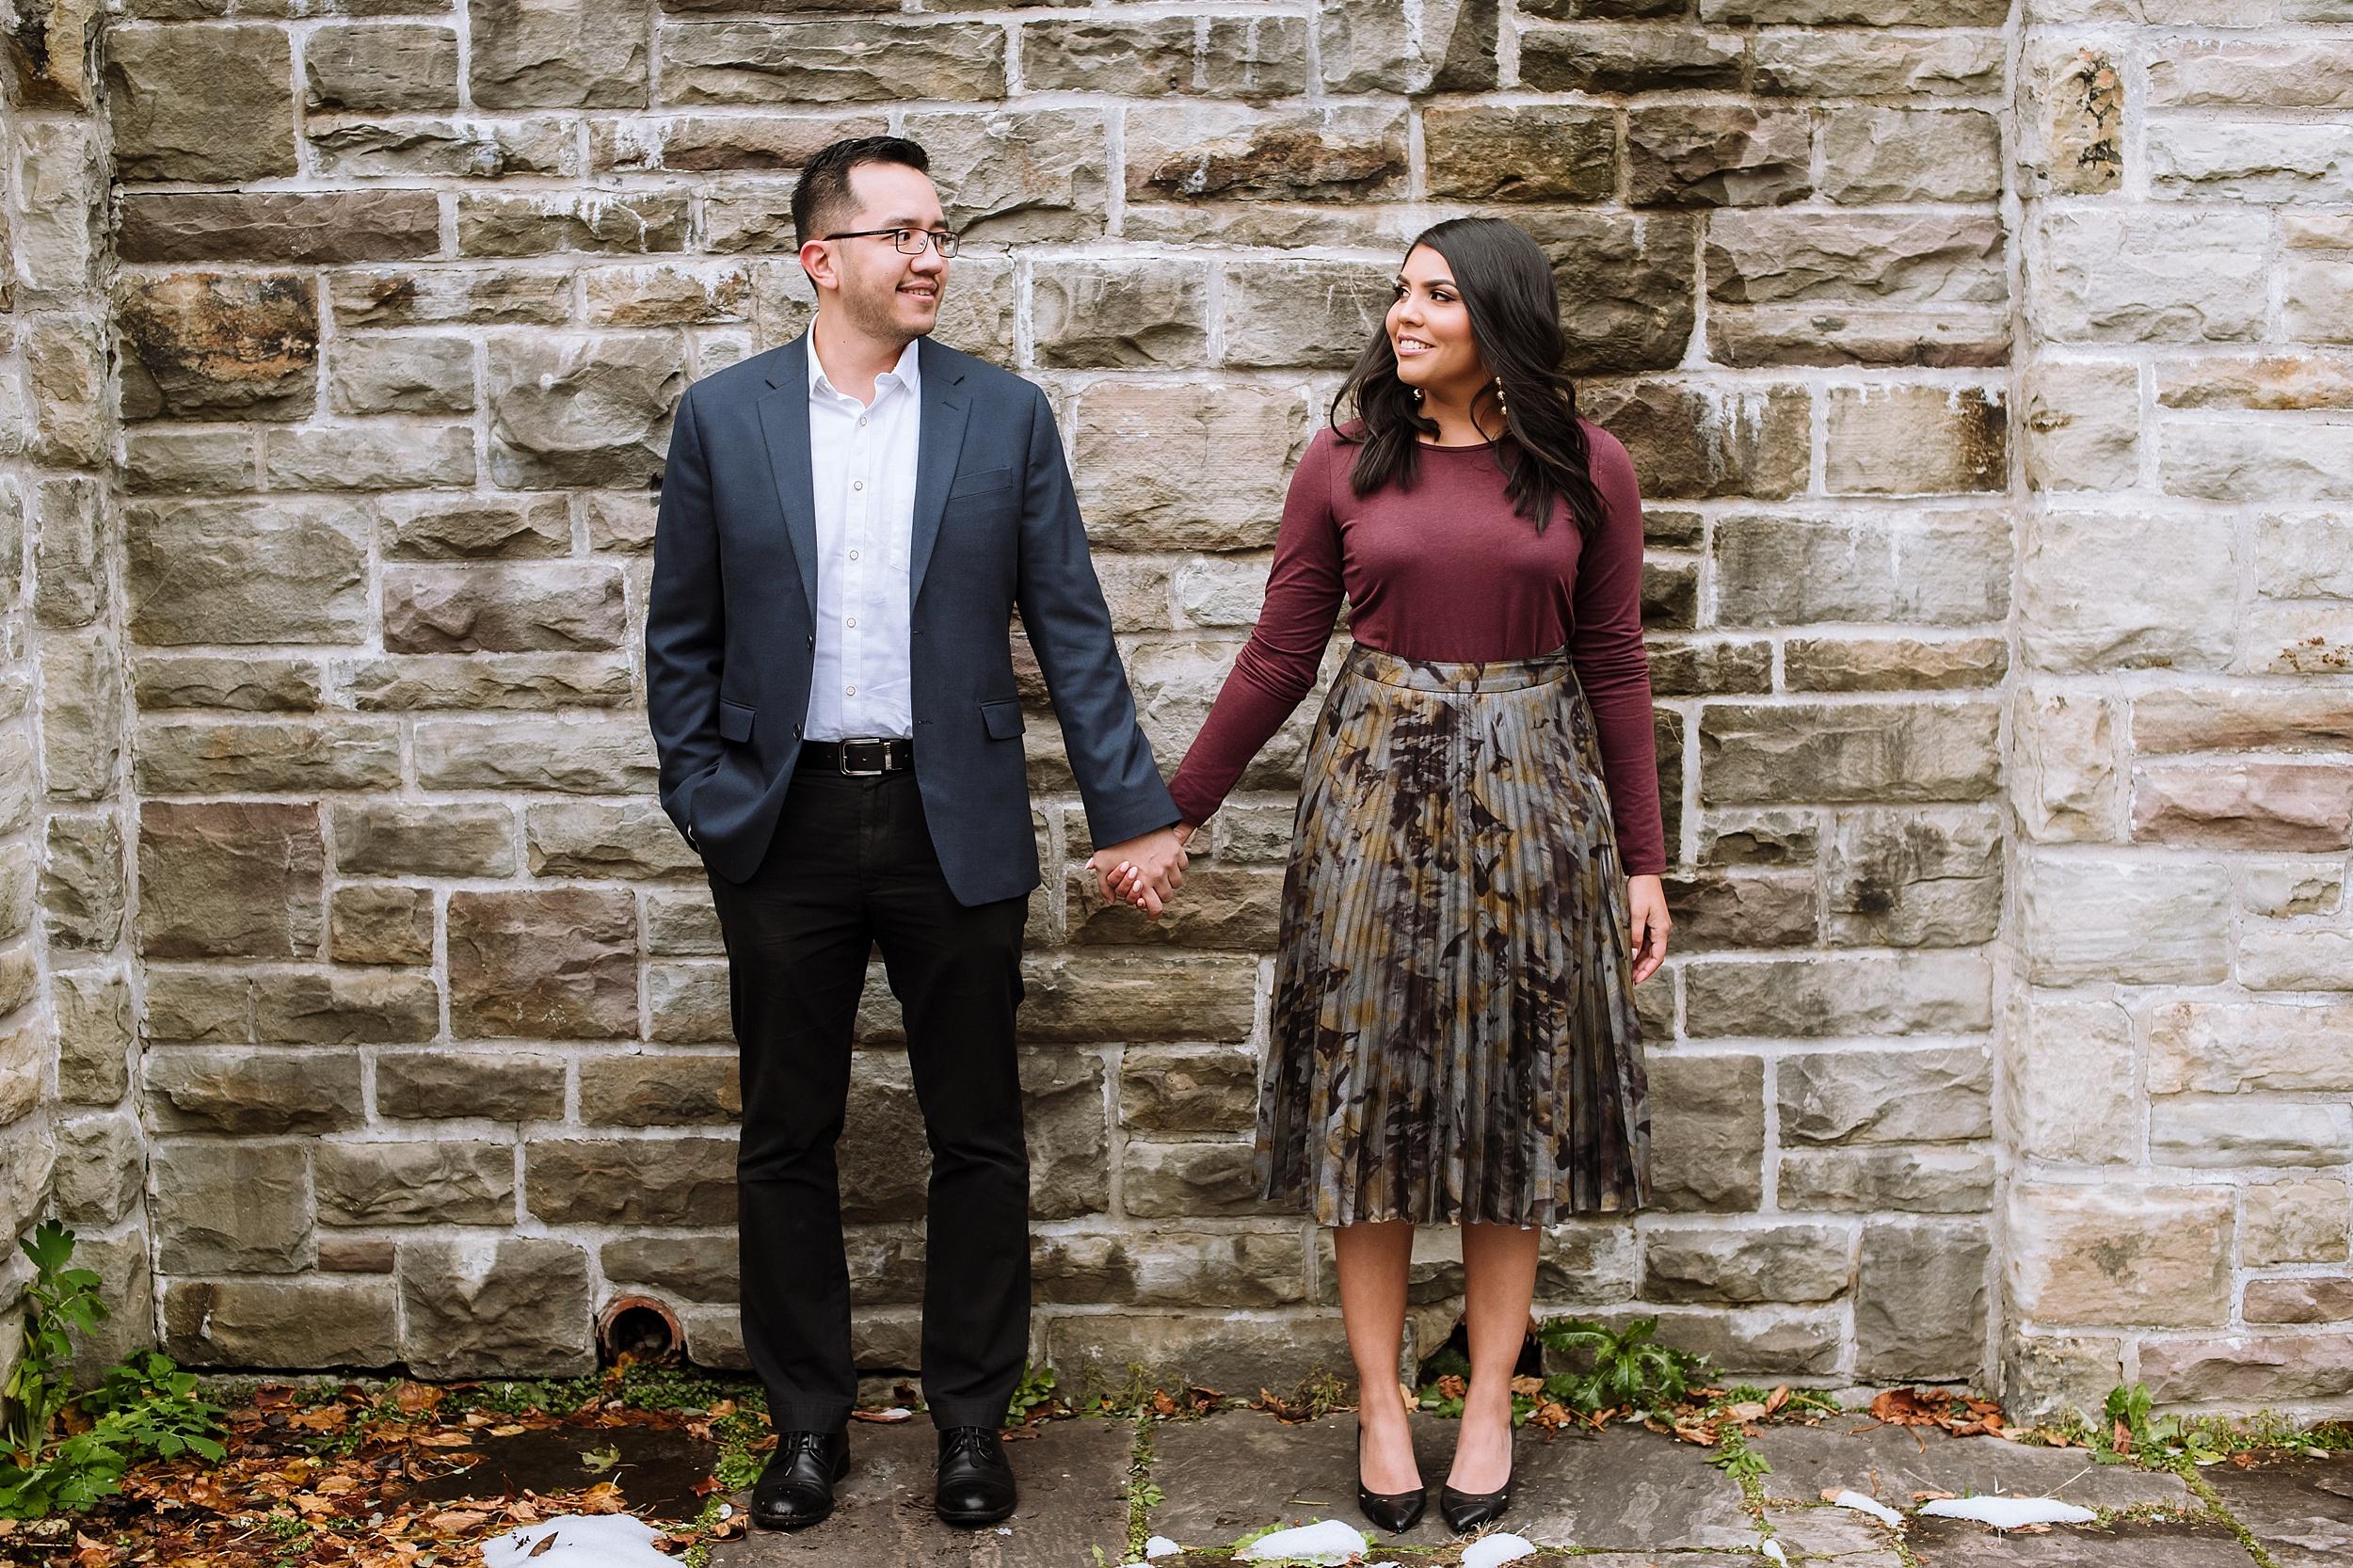 Alexander_Muir_Memorial_Gardens_Engagement_Shoot_Toronto_Wedding_Photographer_0003.jpg